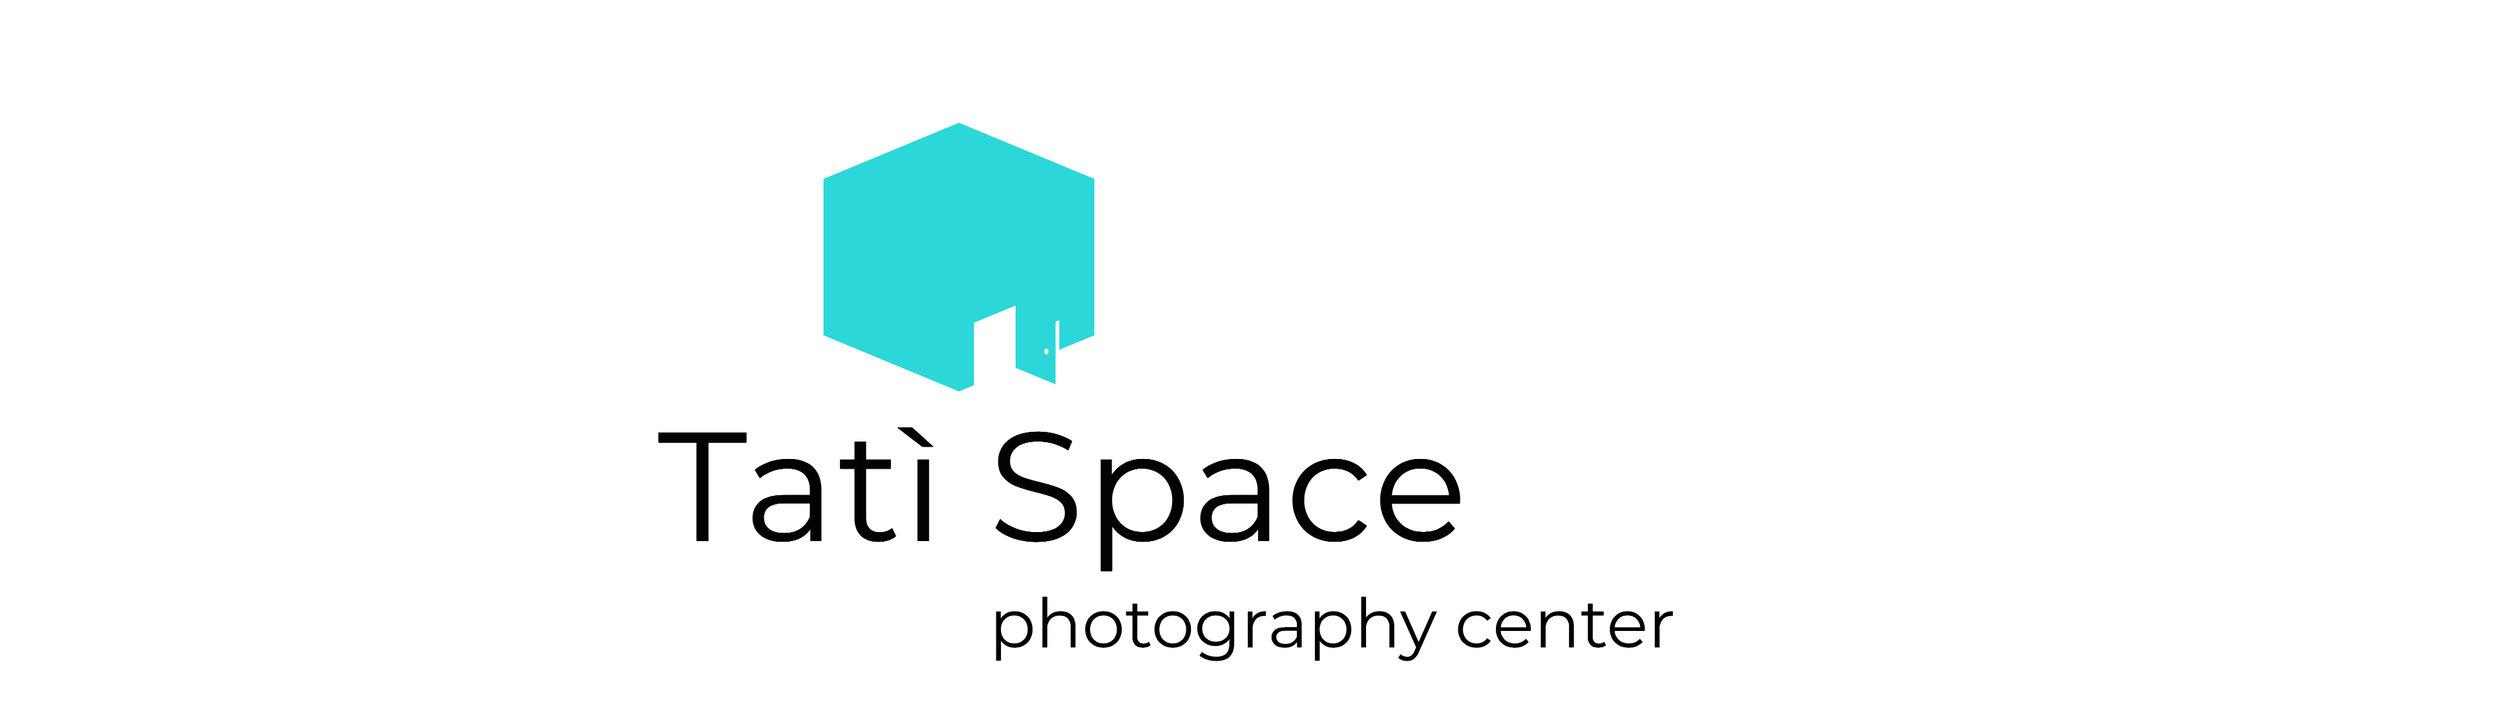 logo_color_300px.jpg